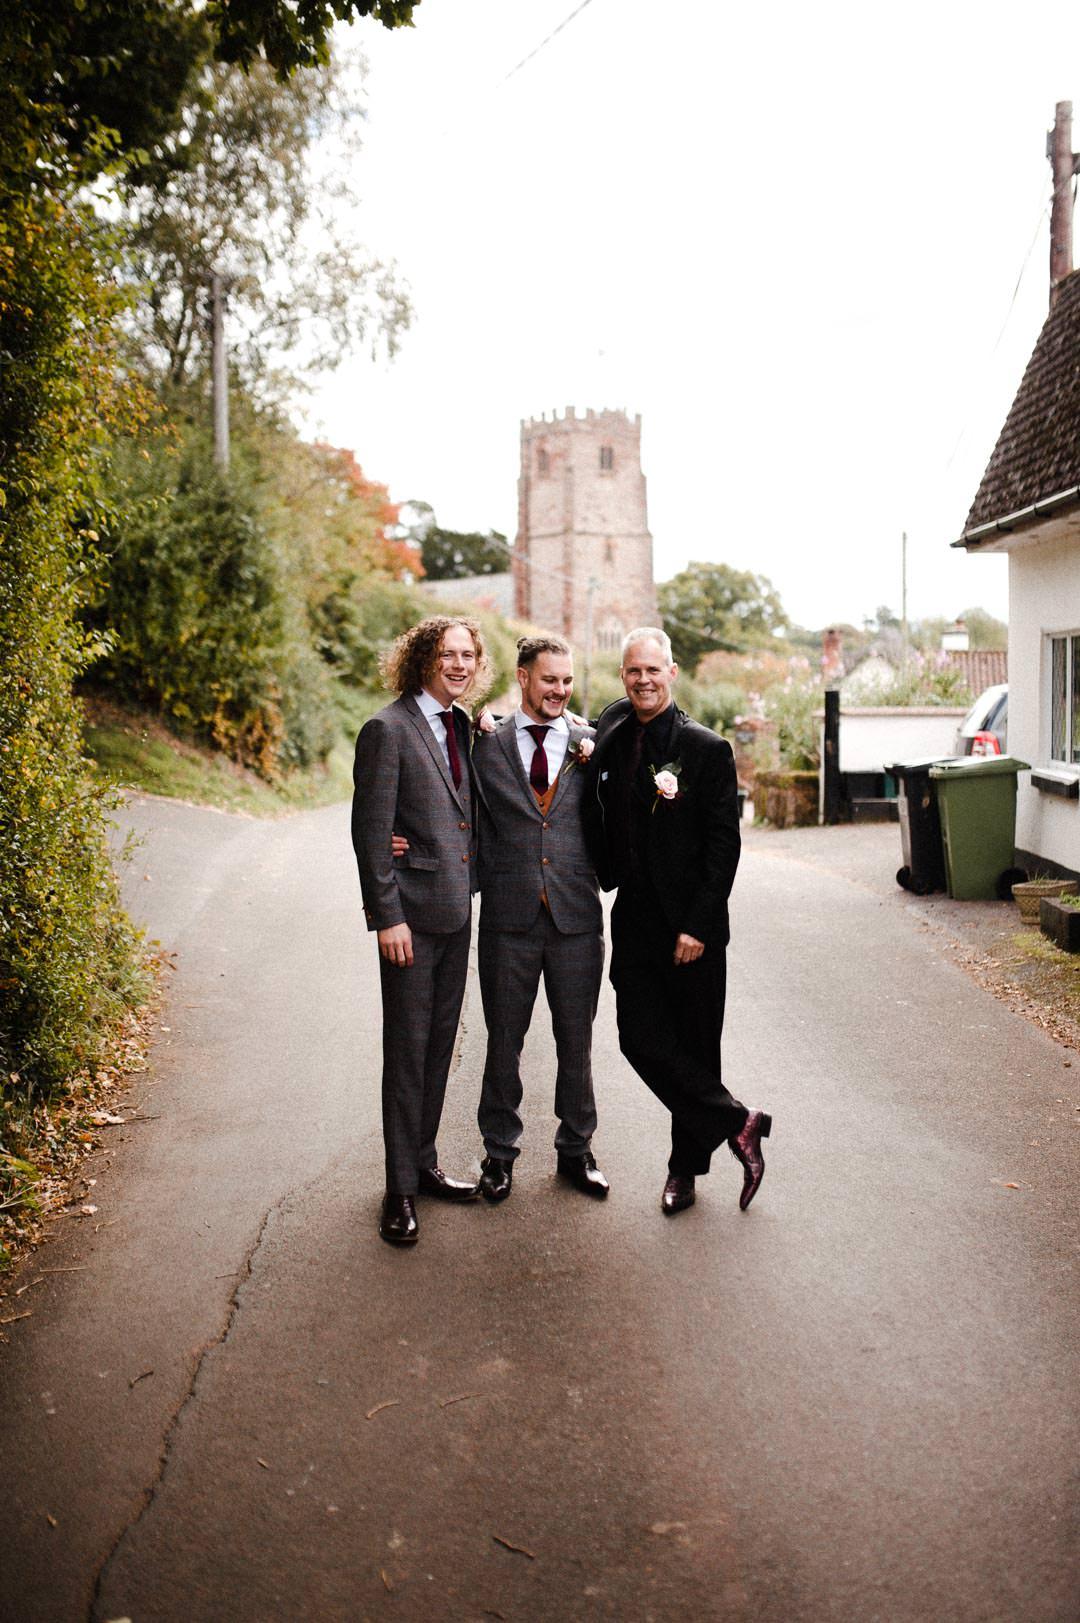 groom and best men at wedding stood in street